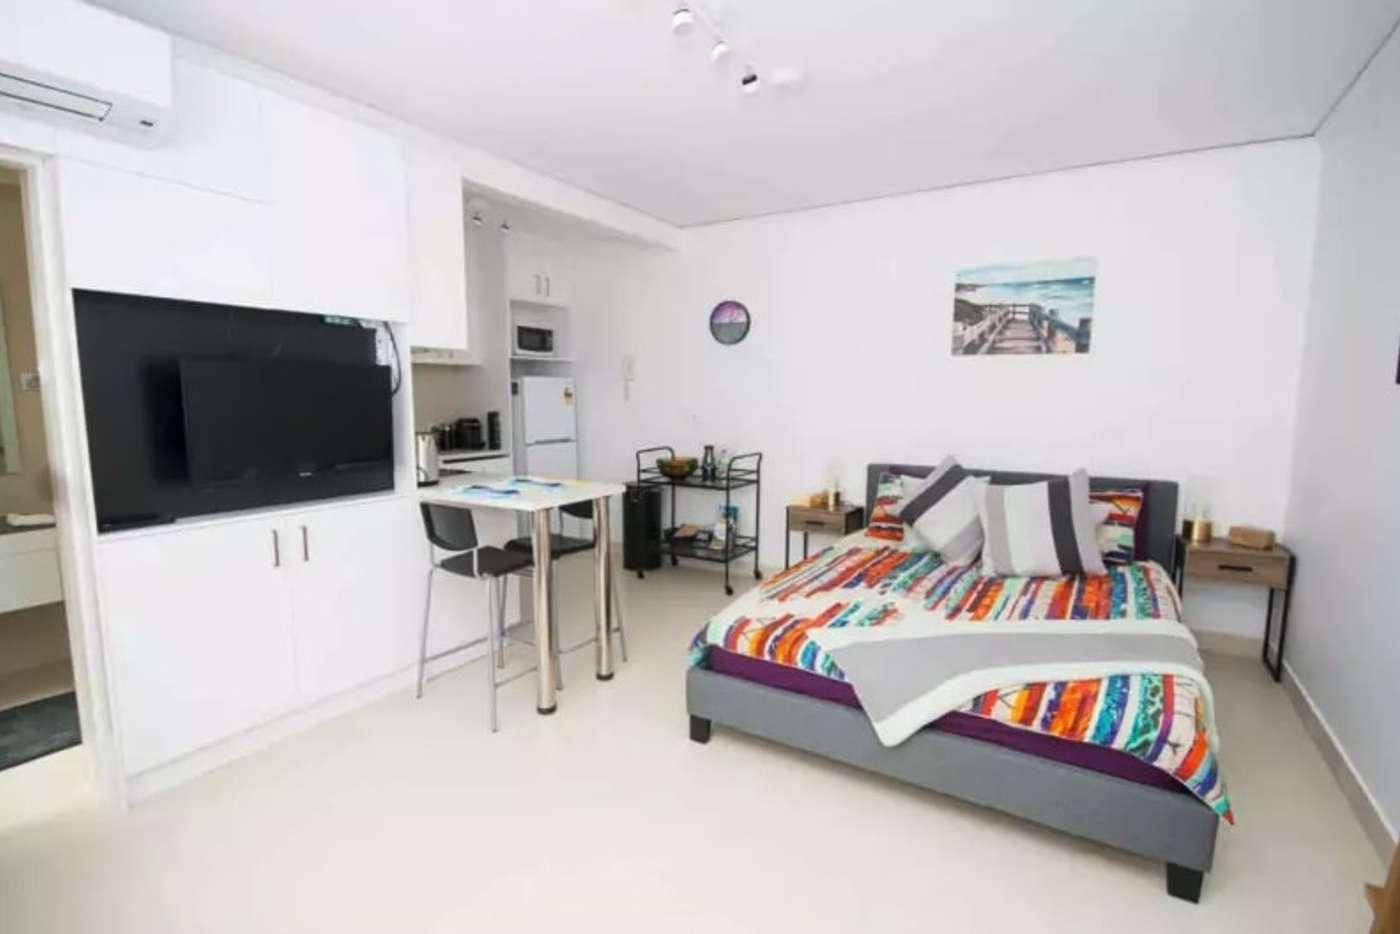 Main view of Homely studio listing, 82 Grey Street, St Kilda VIC 3182